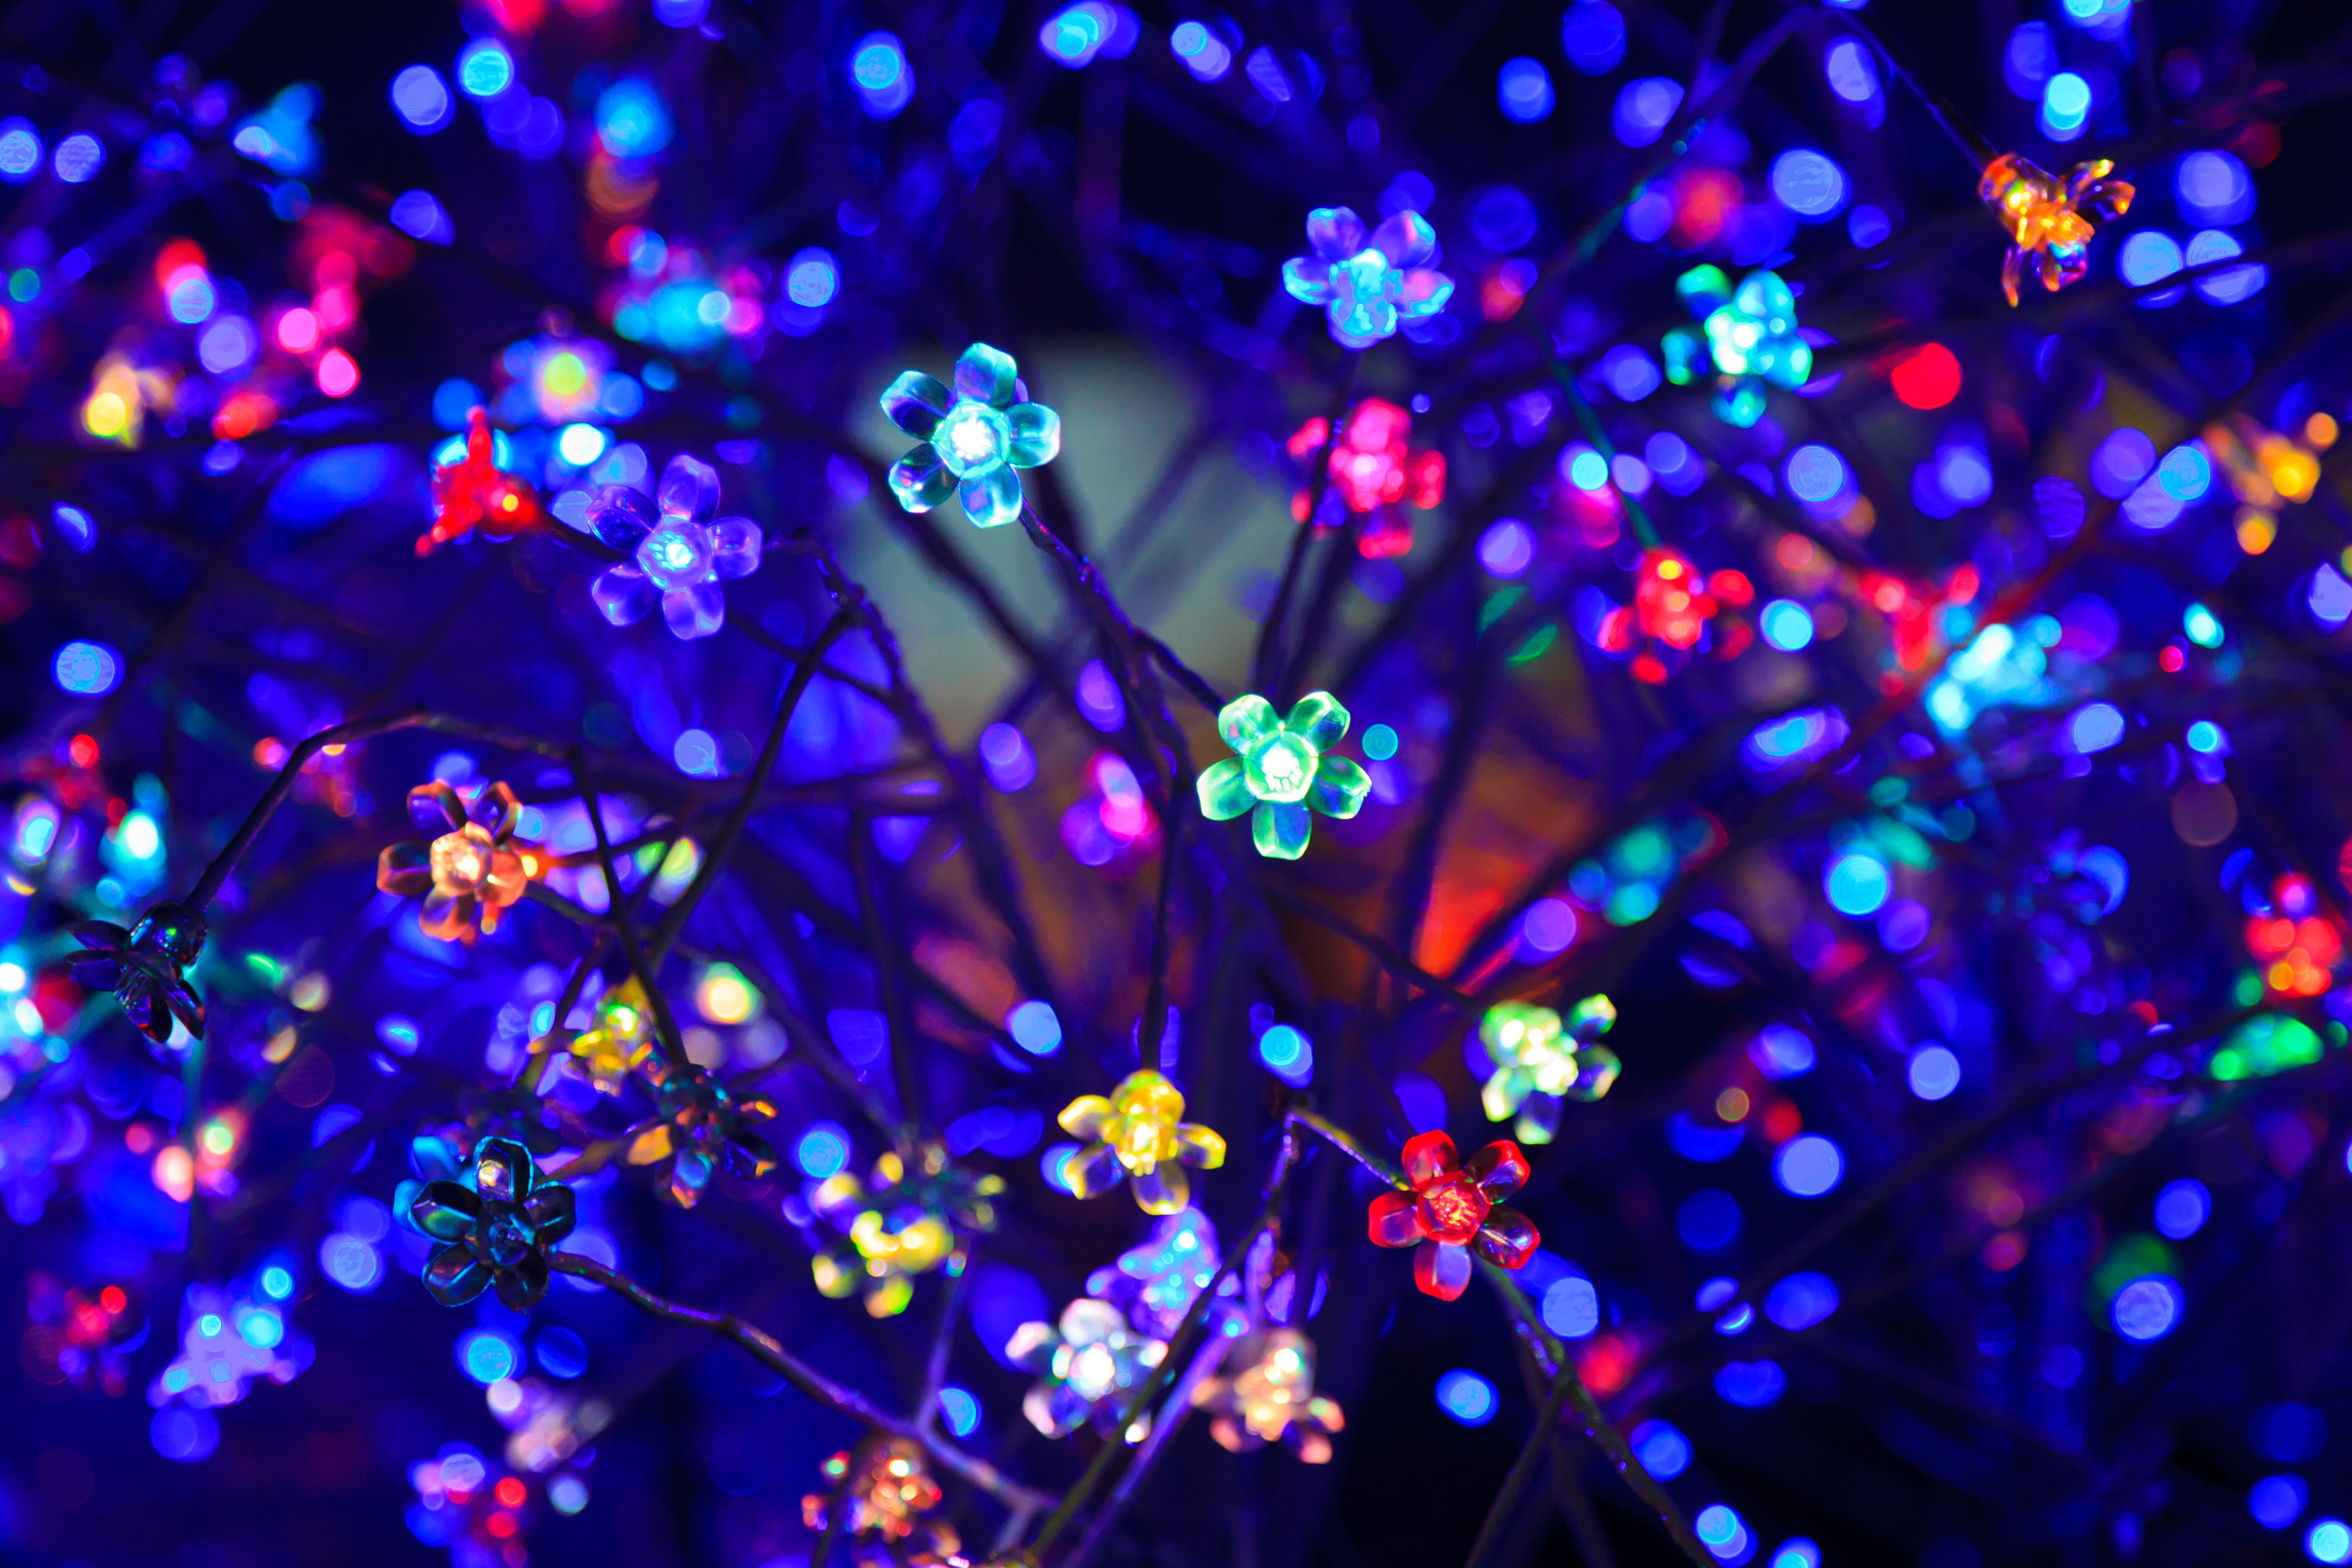 91199 download wallpaper Dark, Light Bulbs, Neon, Shine, Light, Lighting, Illumination, Glare, Bokeh, Boquet, Multicolored, Motley, Flowers screensavers and pictures for free